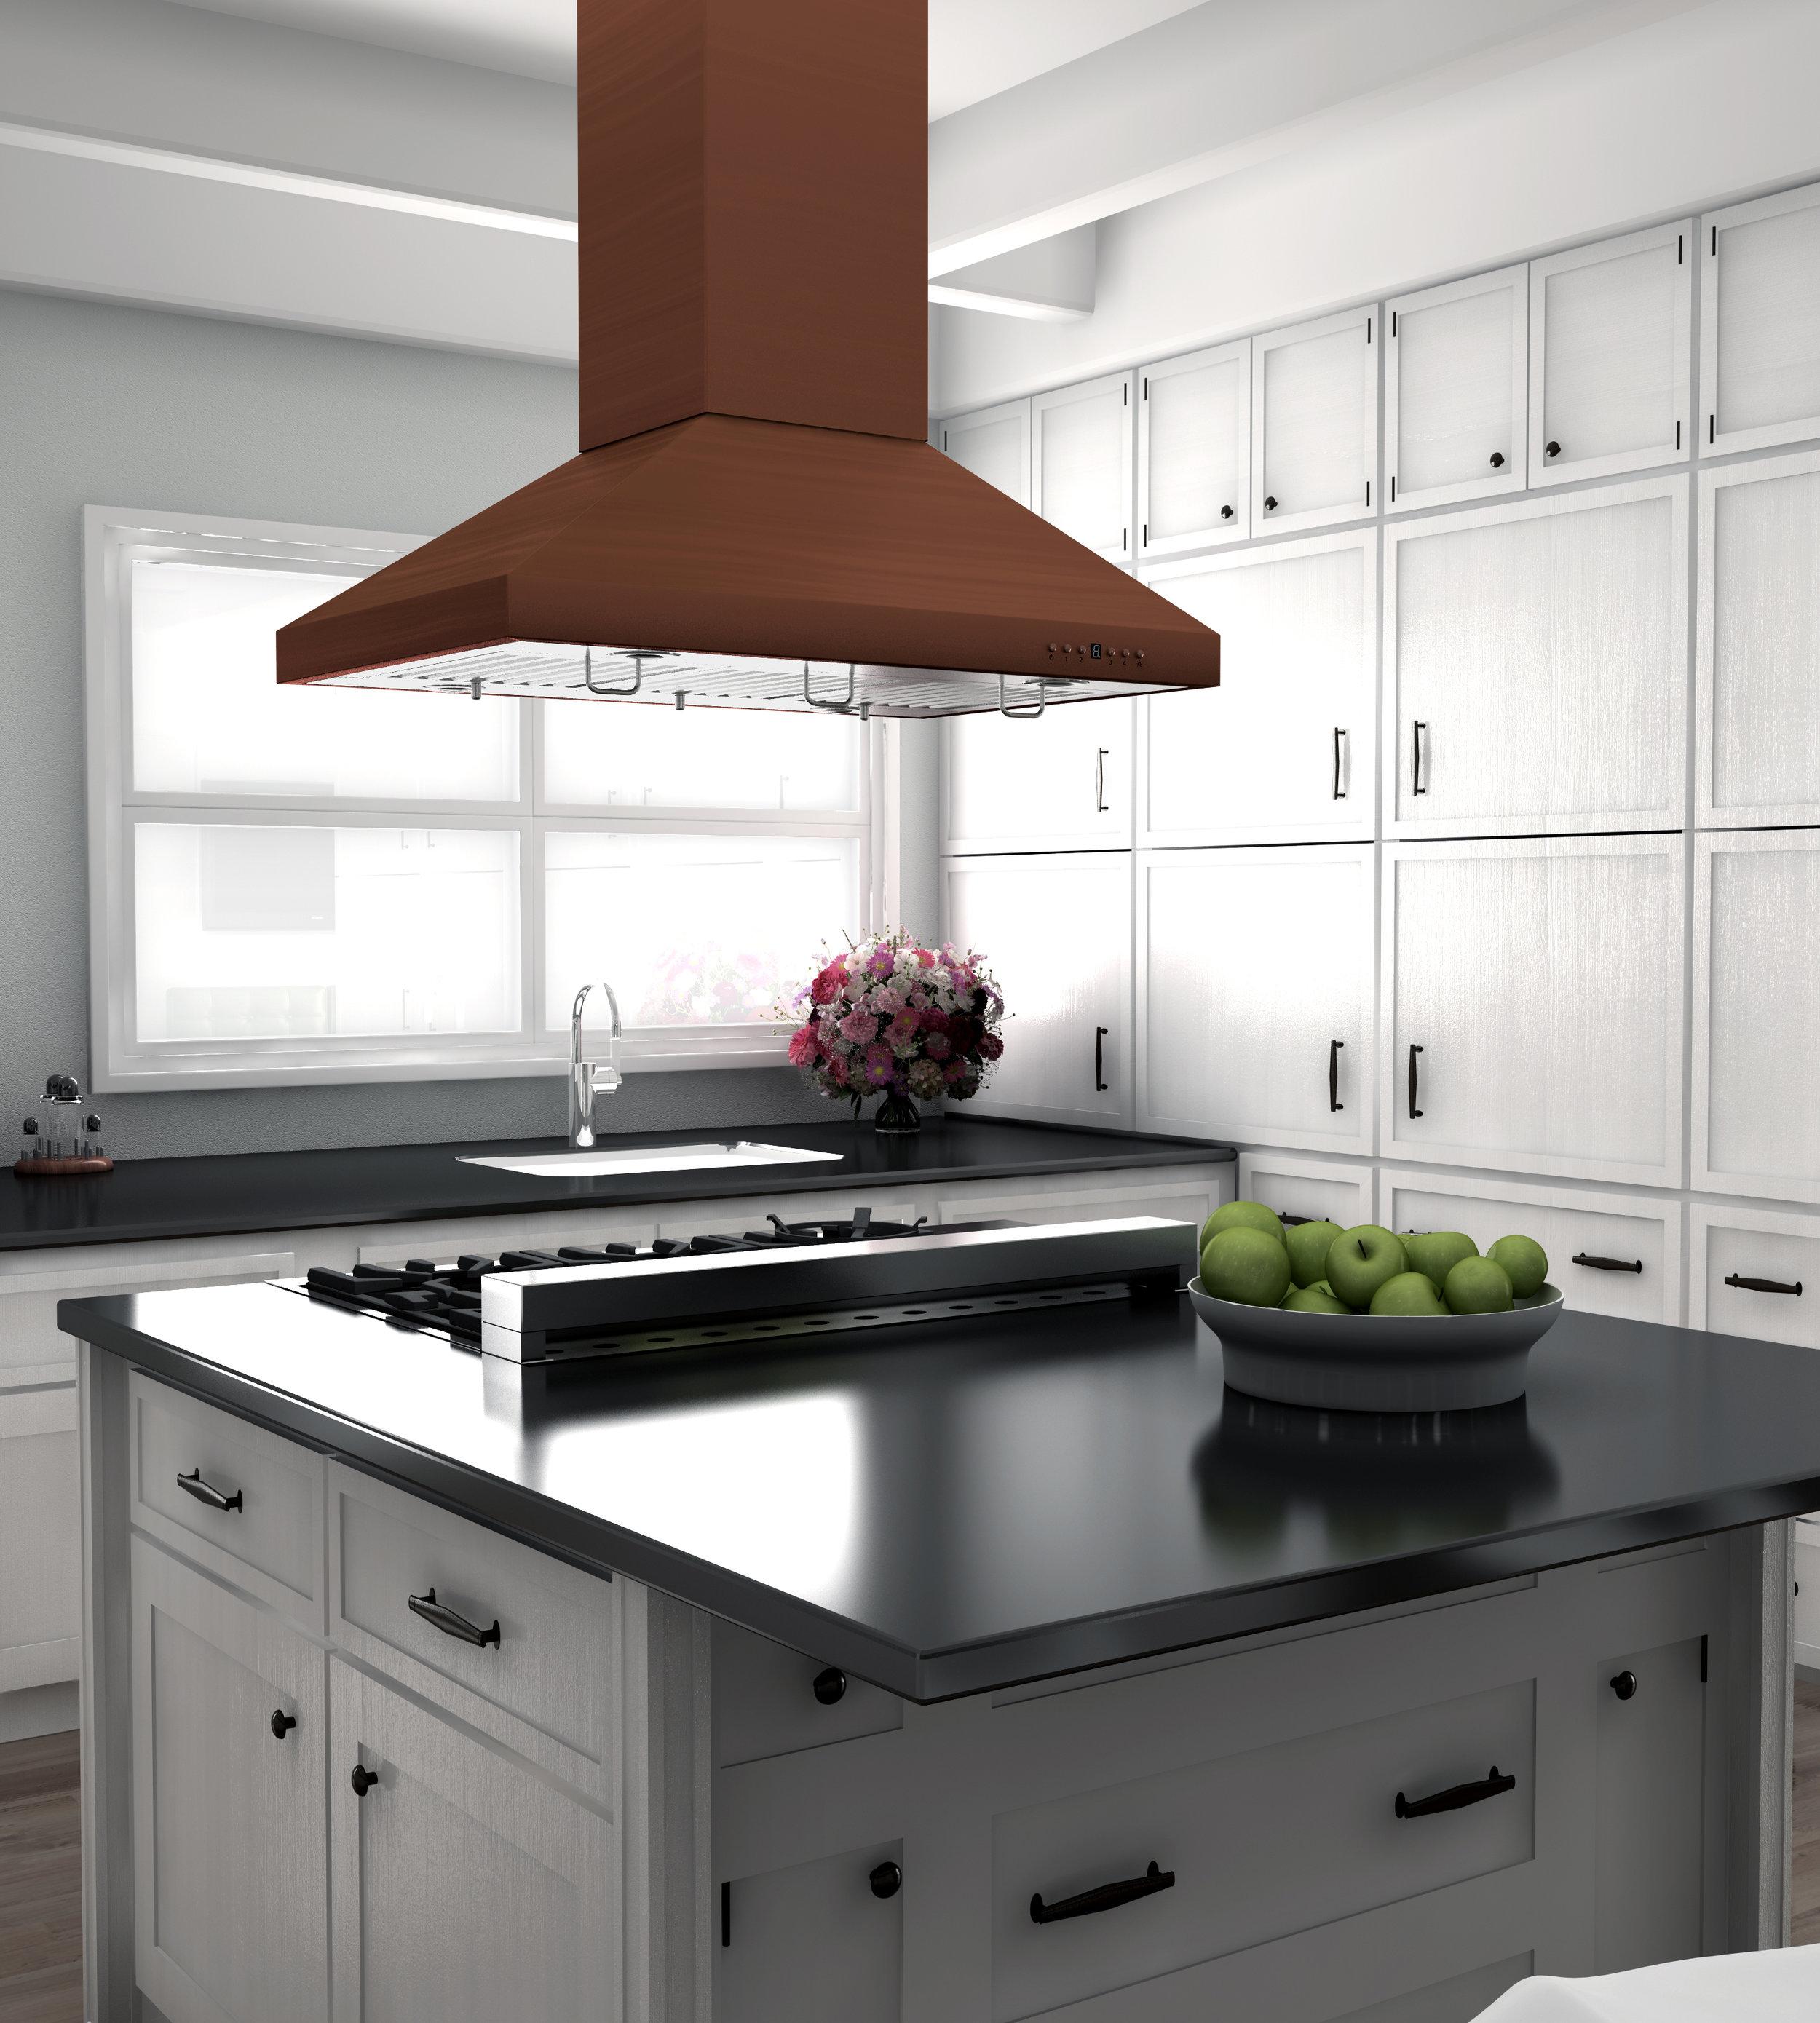 zline-copper-island-mounted-range-hood-8kl3ic-kitchen-new-2.jpg